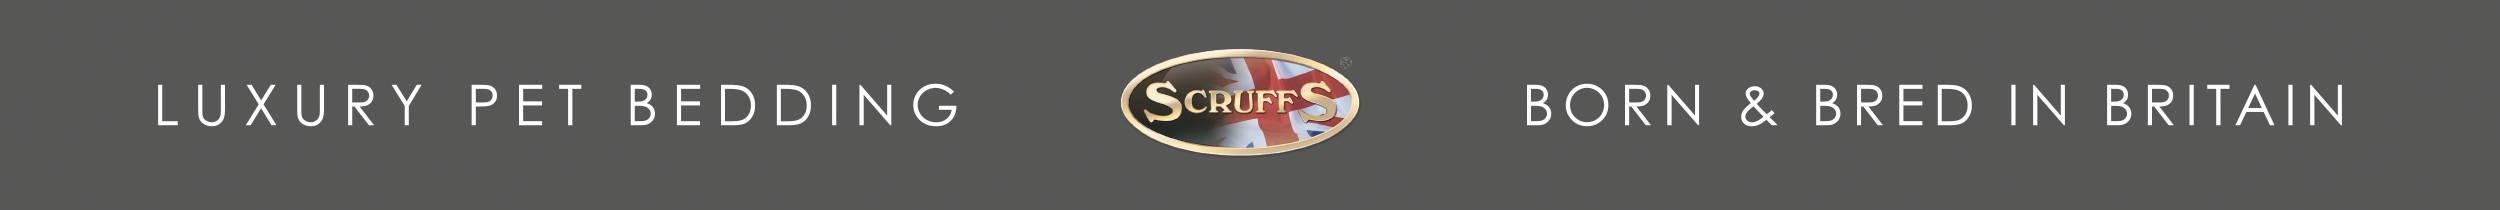 luxury pet bedding by scruffs